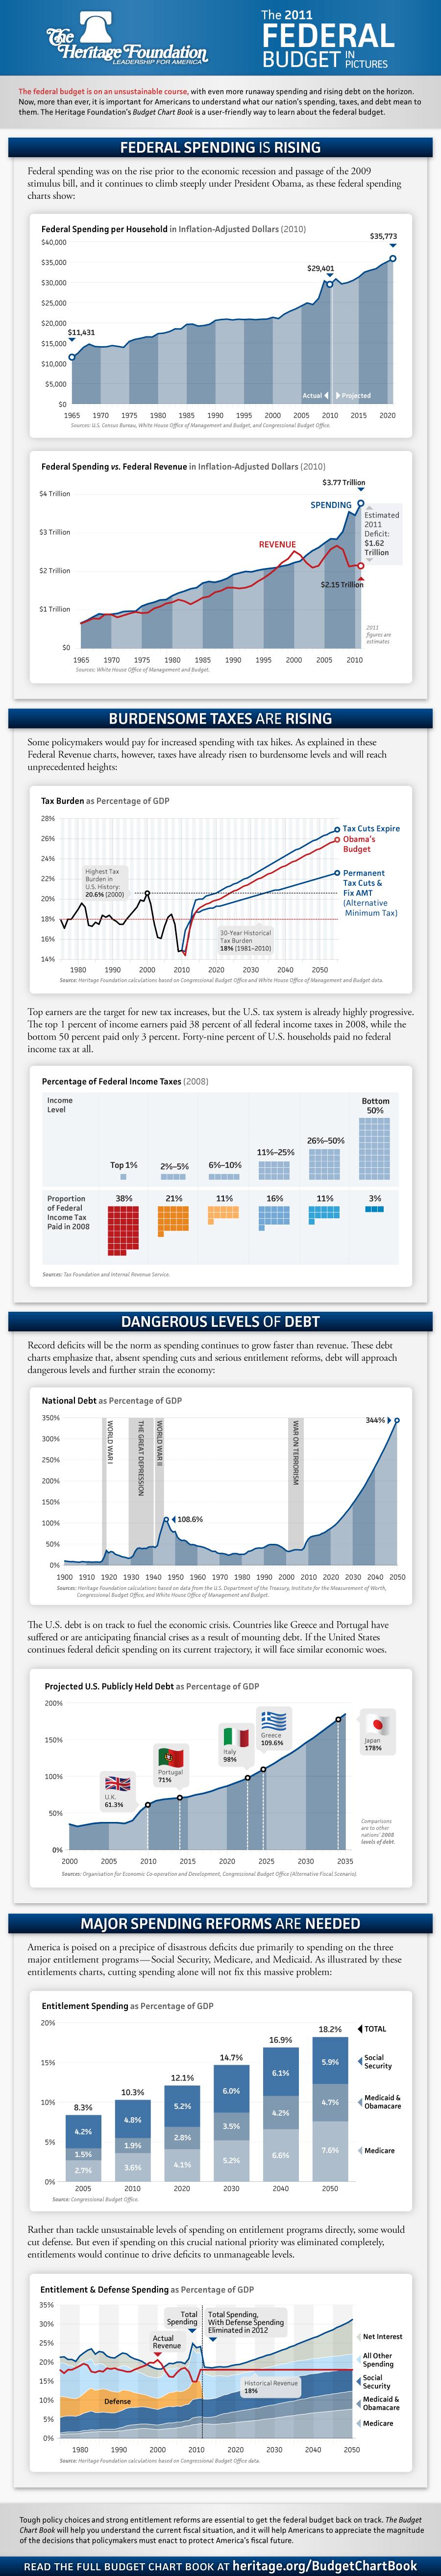 2011 Federal Budget